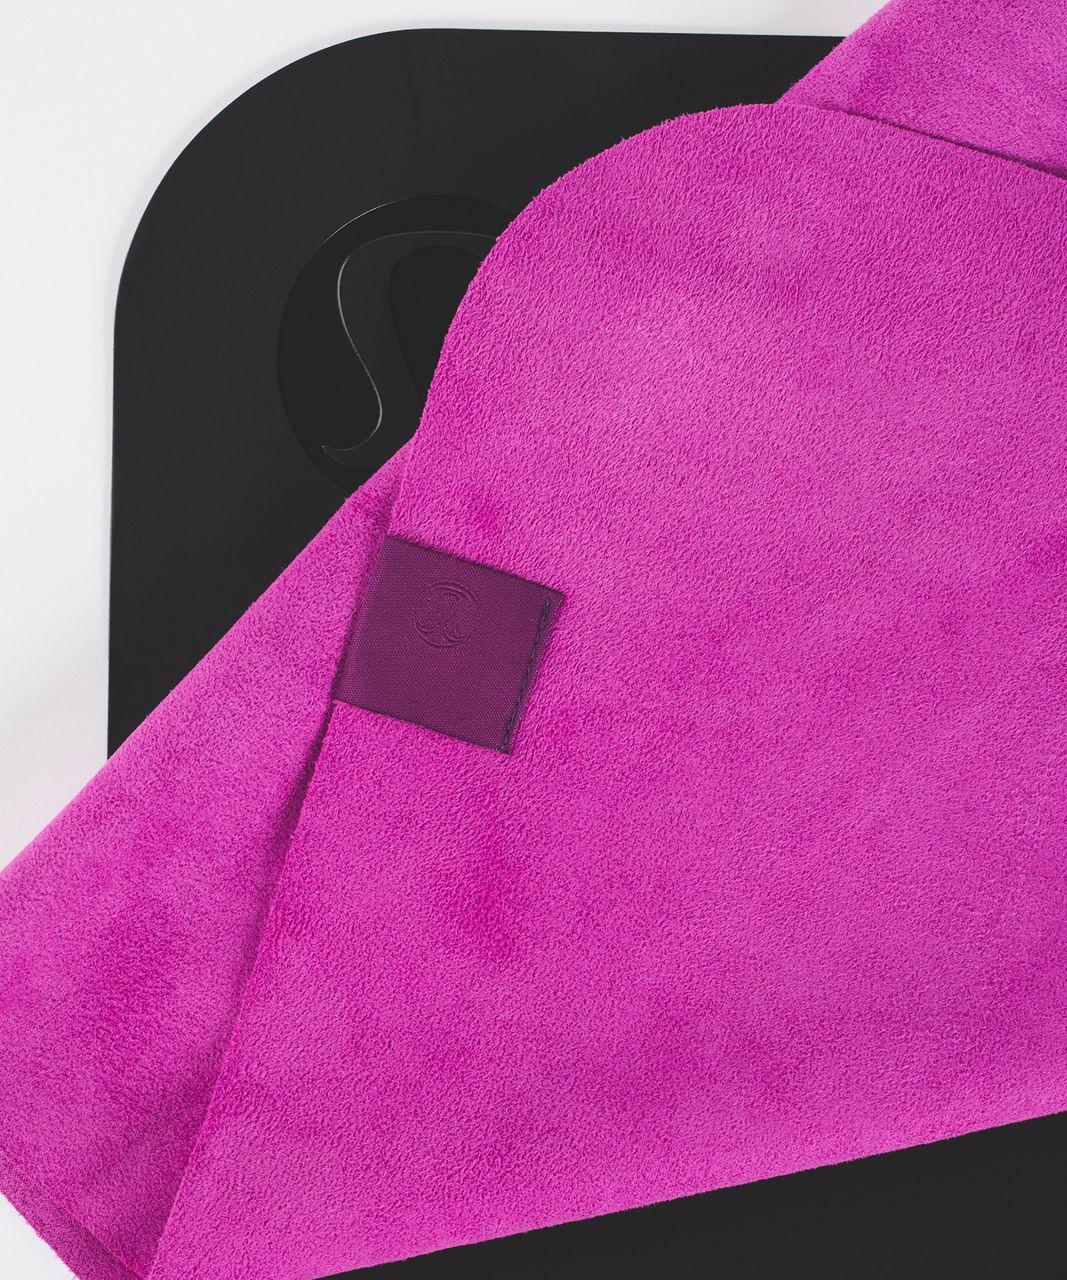 Lululemon The (Small) Towel - Polar Pink